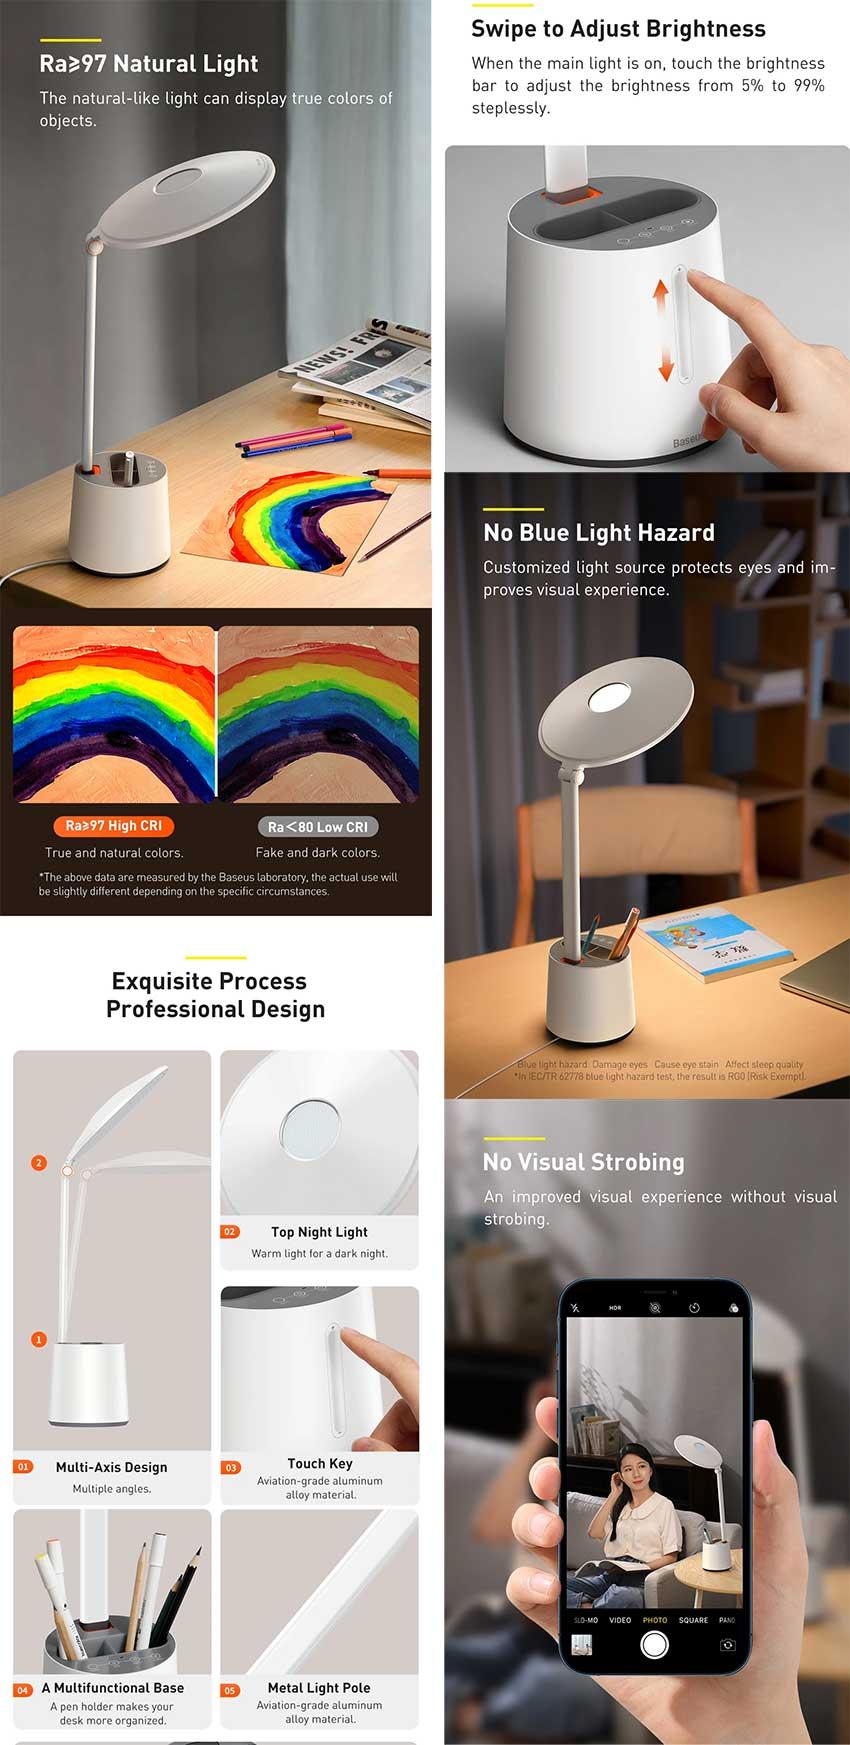 Baseus-Full-Spectrum-AAA-Reading-and-Writing-Desk-Lamp-2.jpg?1624711060961